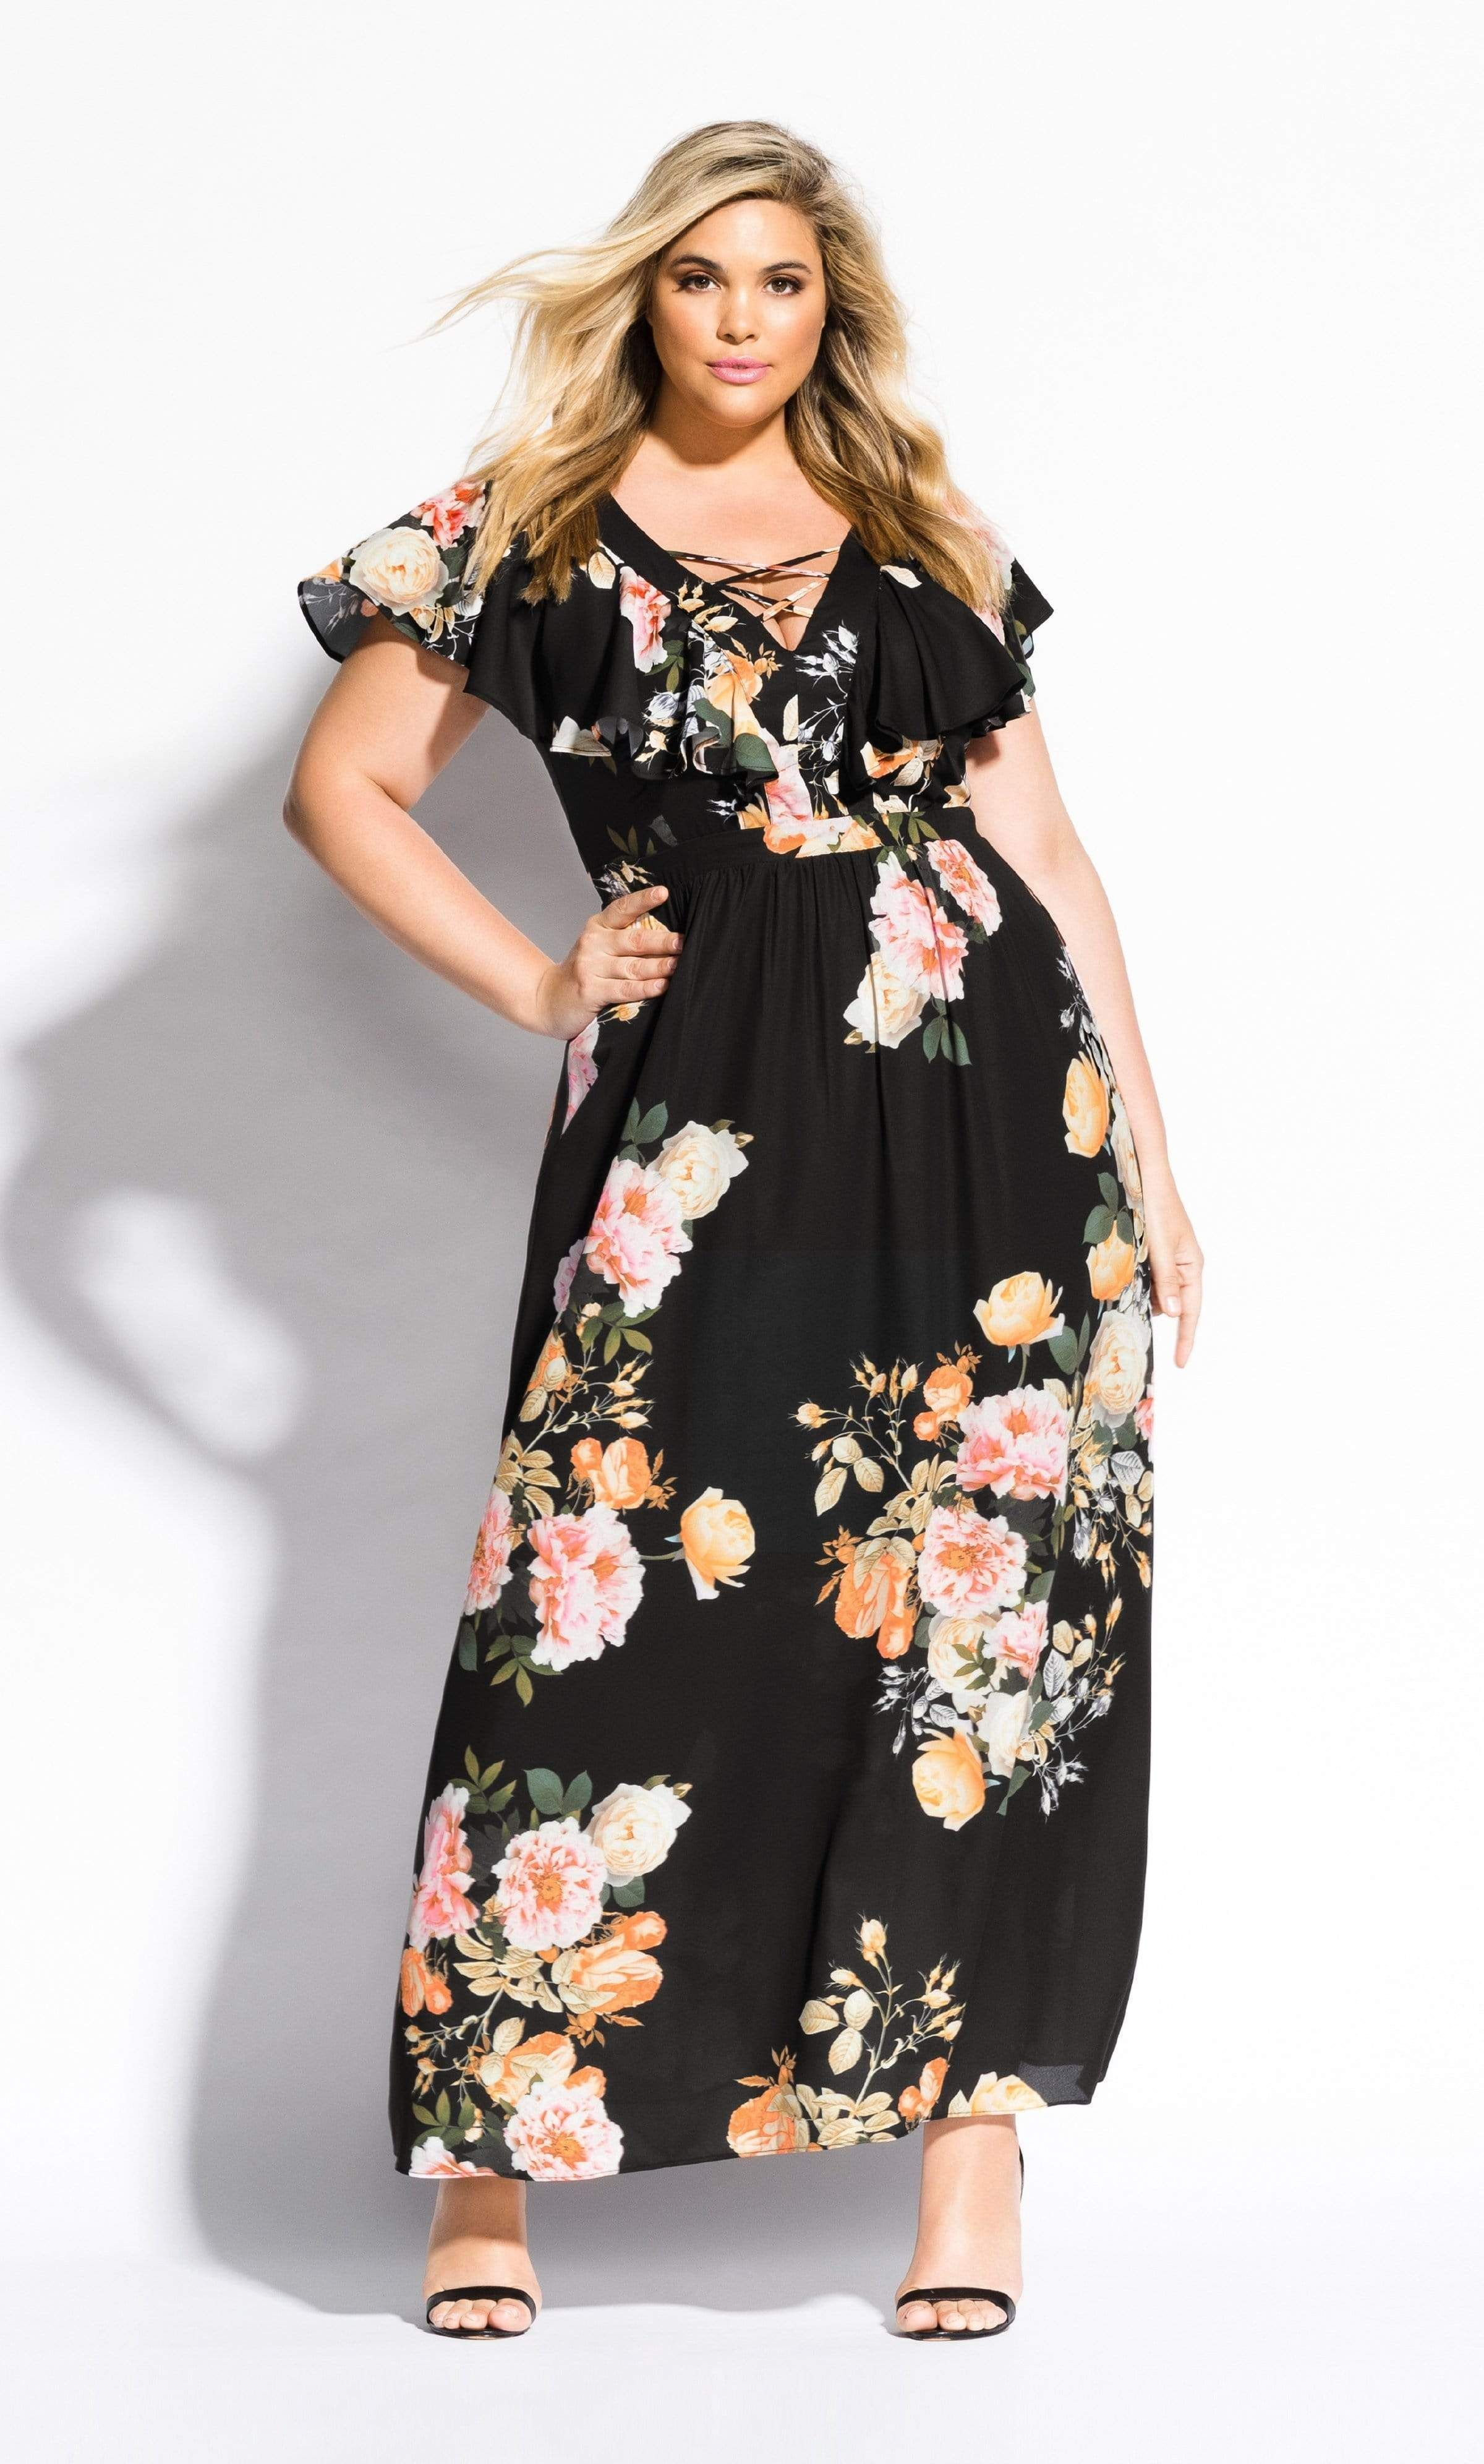 Tuscan Rose Maxi Dress Black14 Xs Rose Maxi Dress Maxi Dress Plus Size Summer Dresses [ 3984 x 2400 Pixel ]